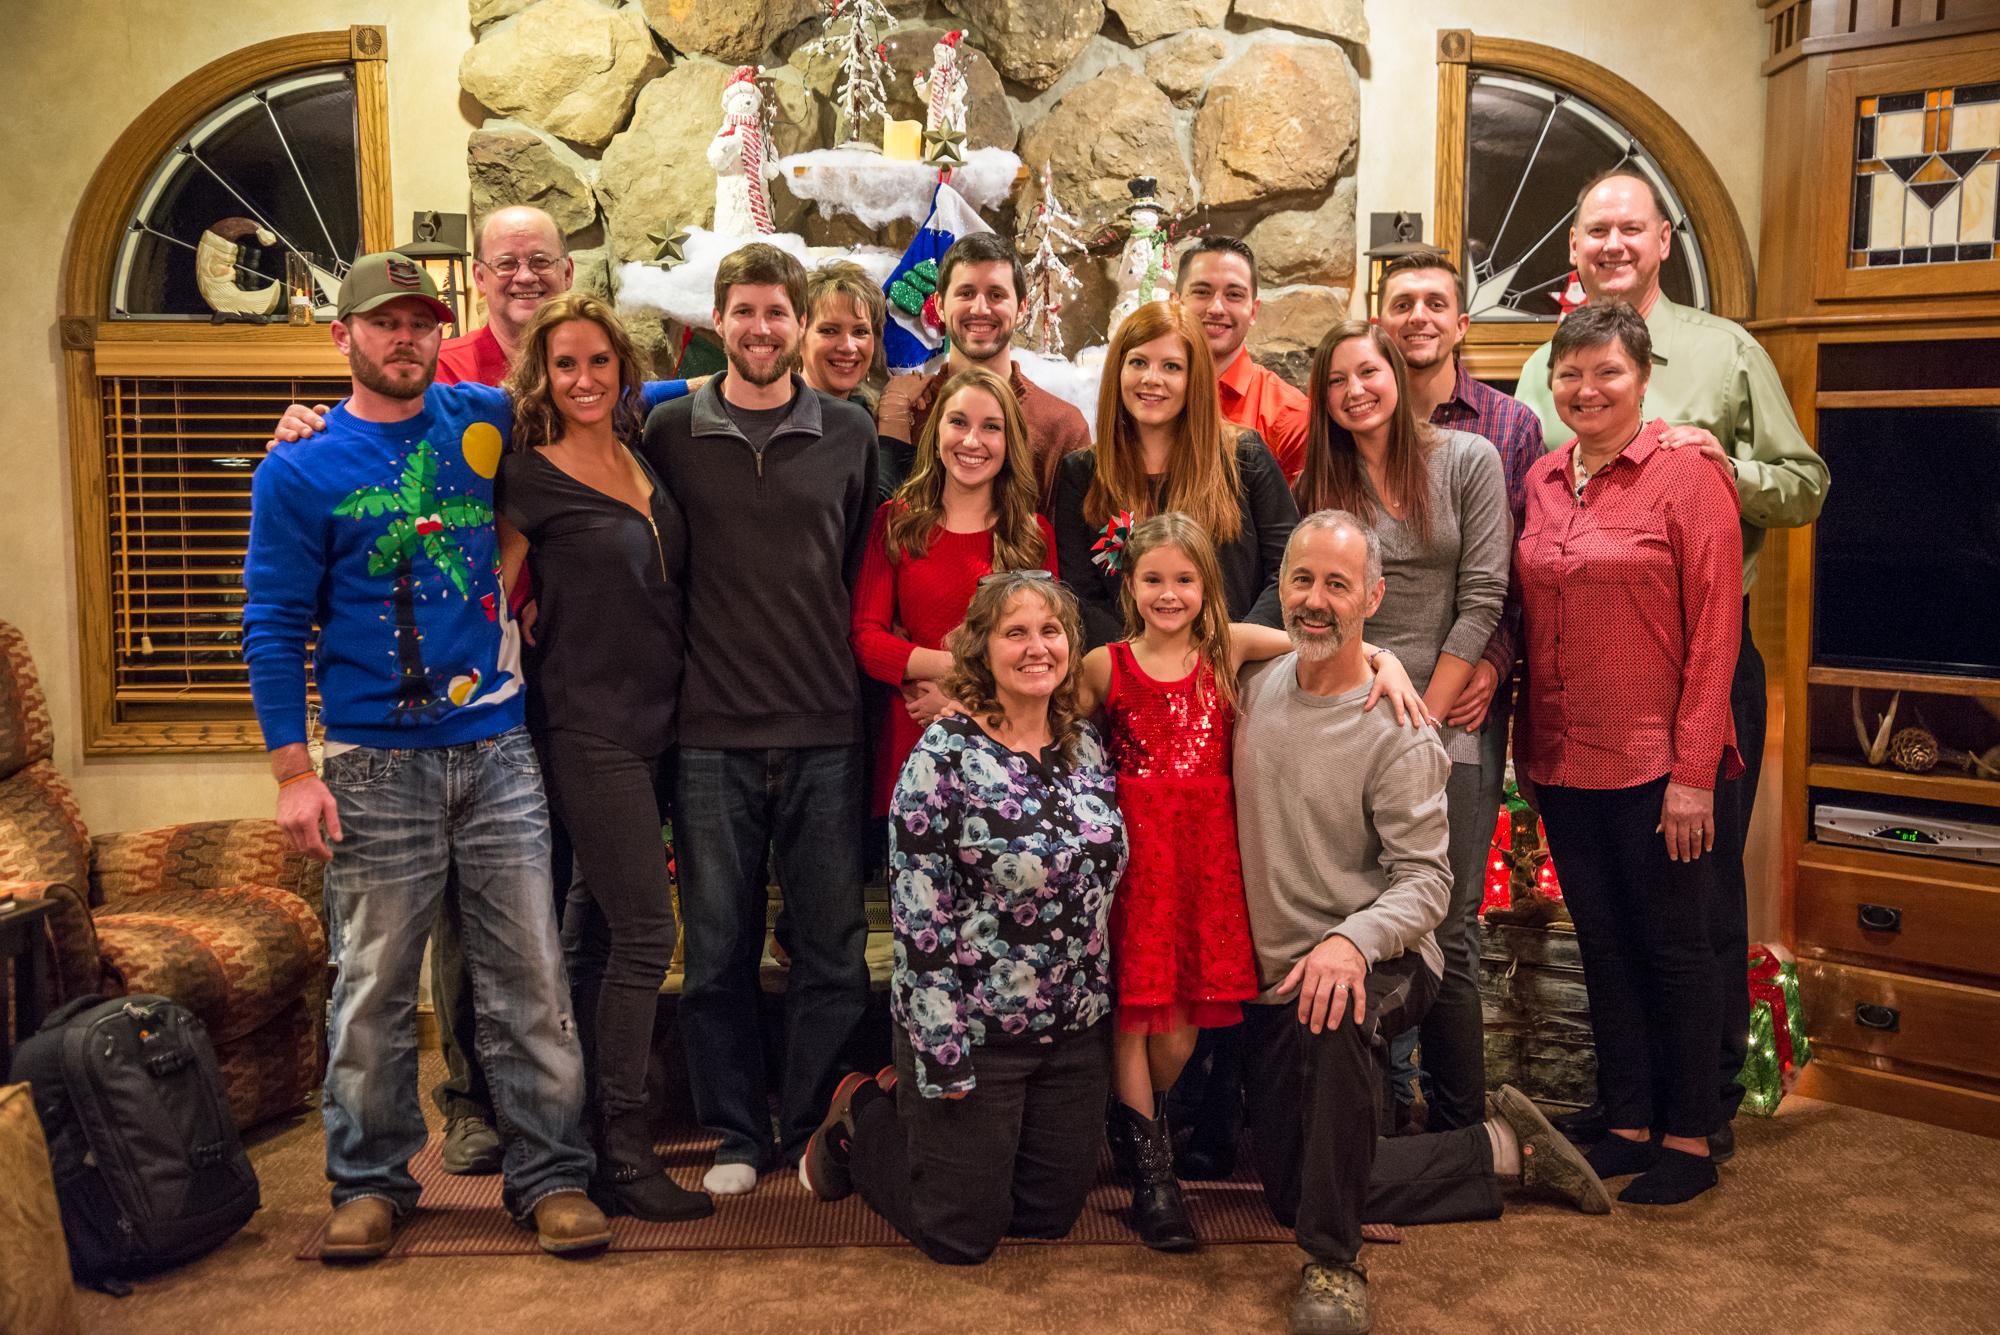 Christmas 2015 - Green, Ohio